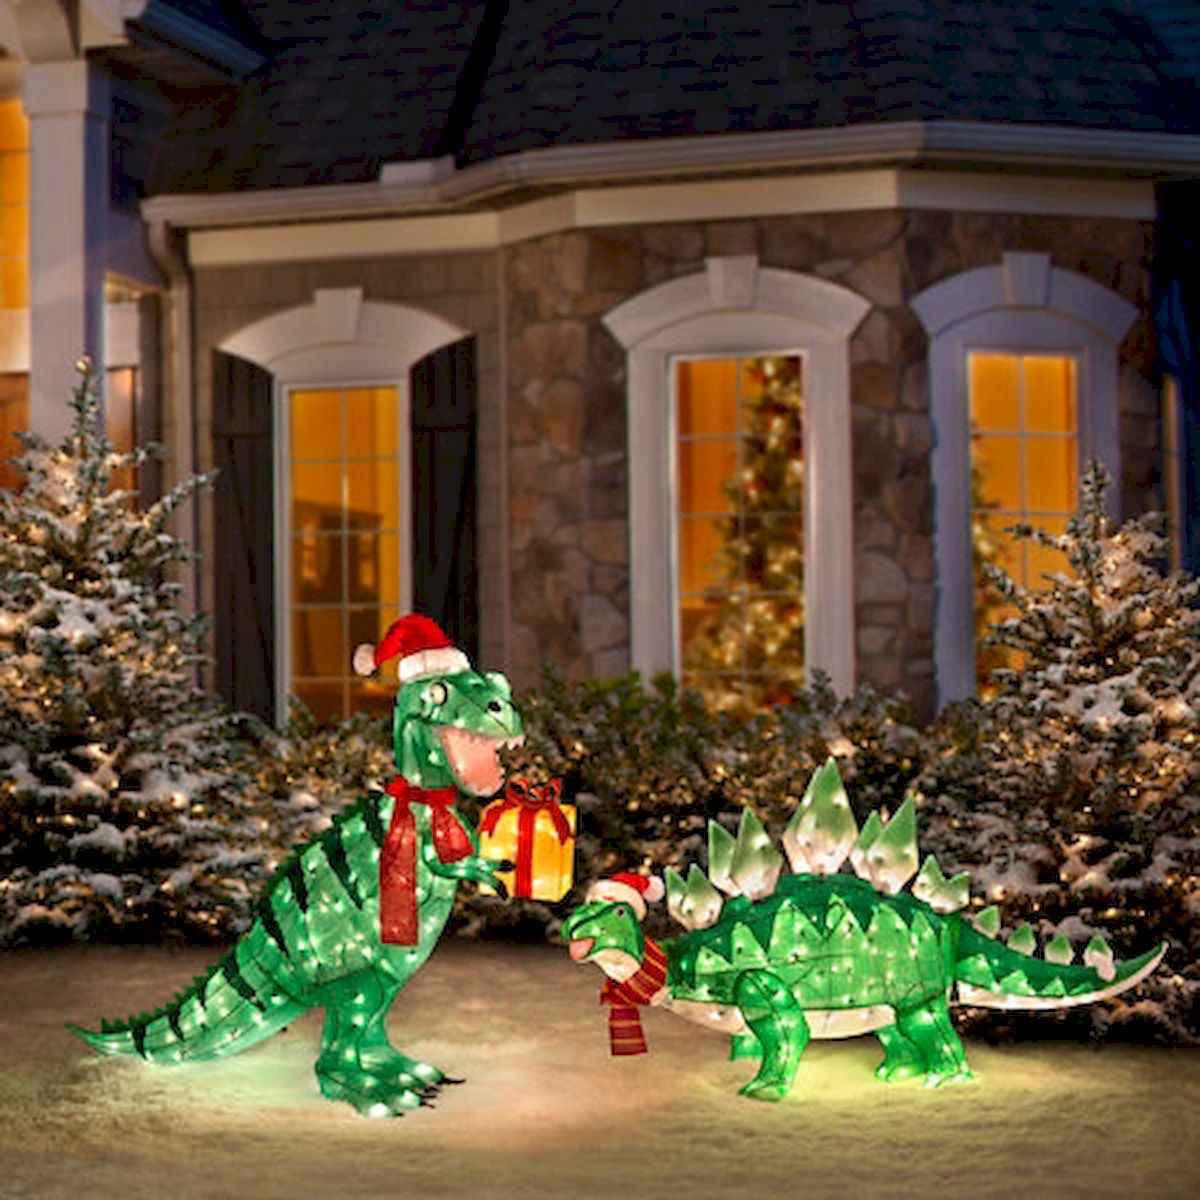 40 amazing outdoor christmas decorations ideas (37)